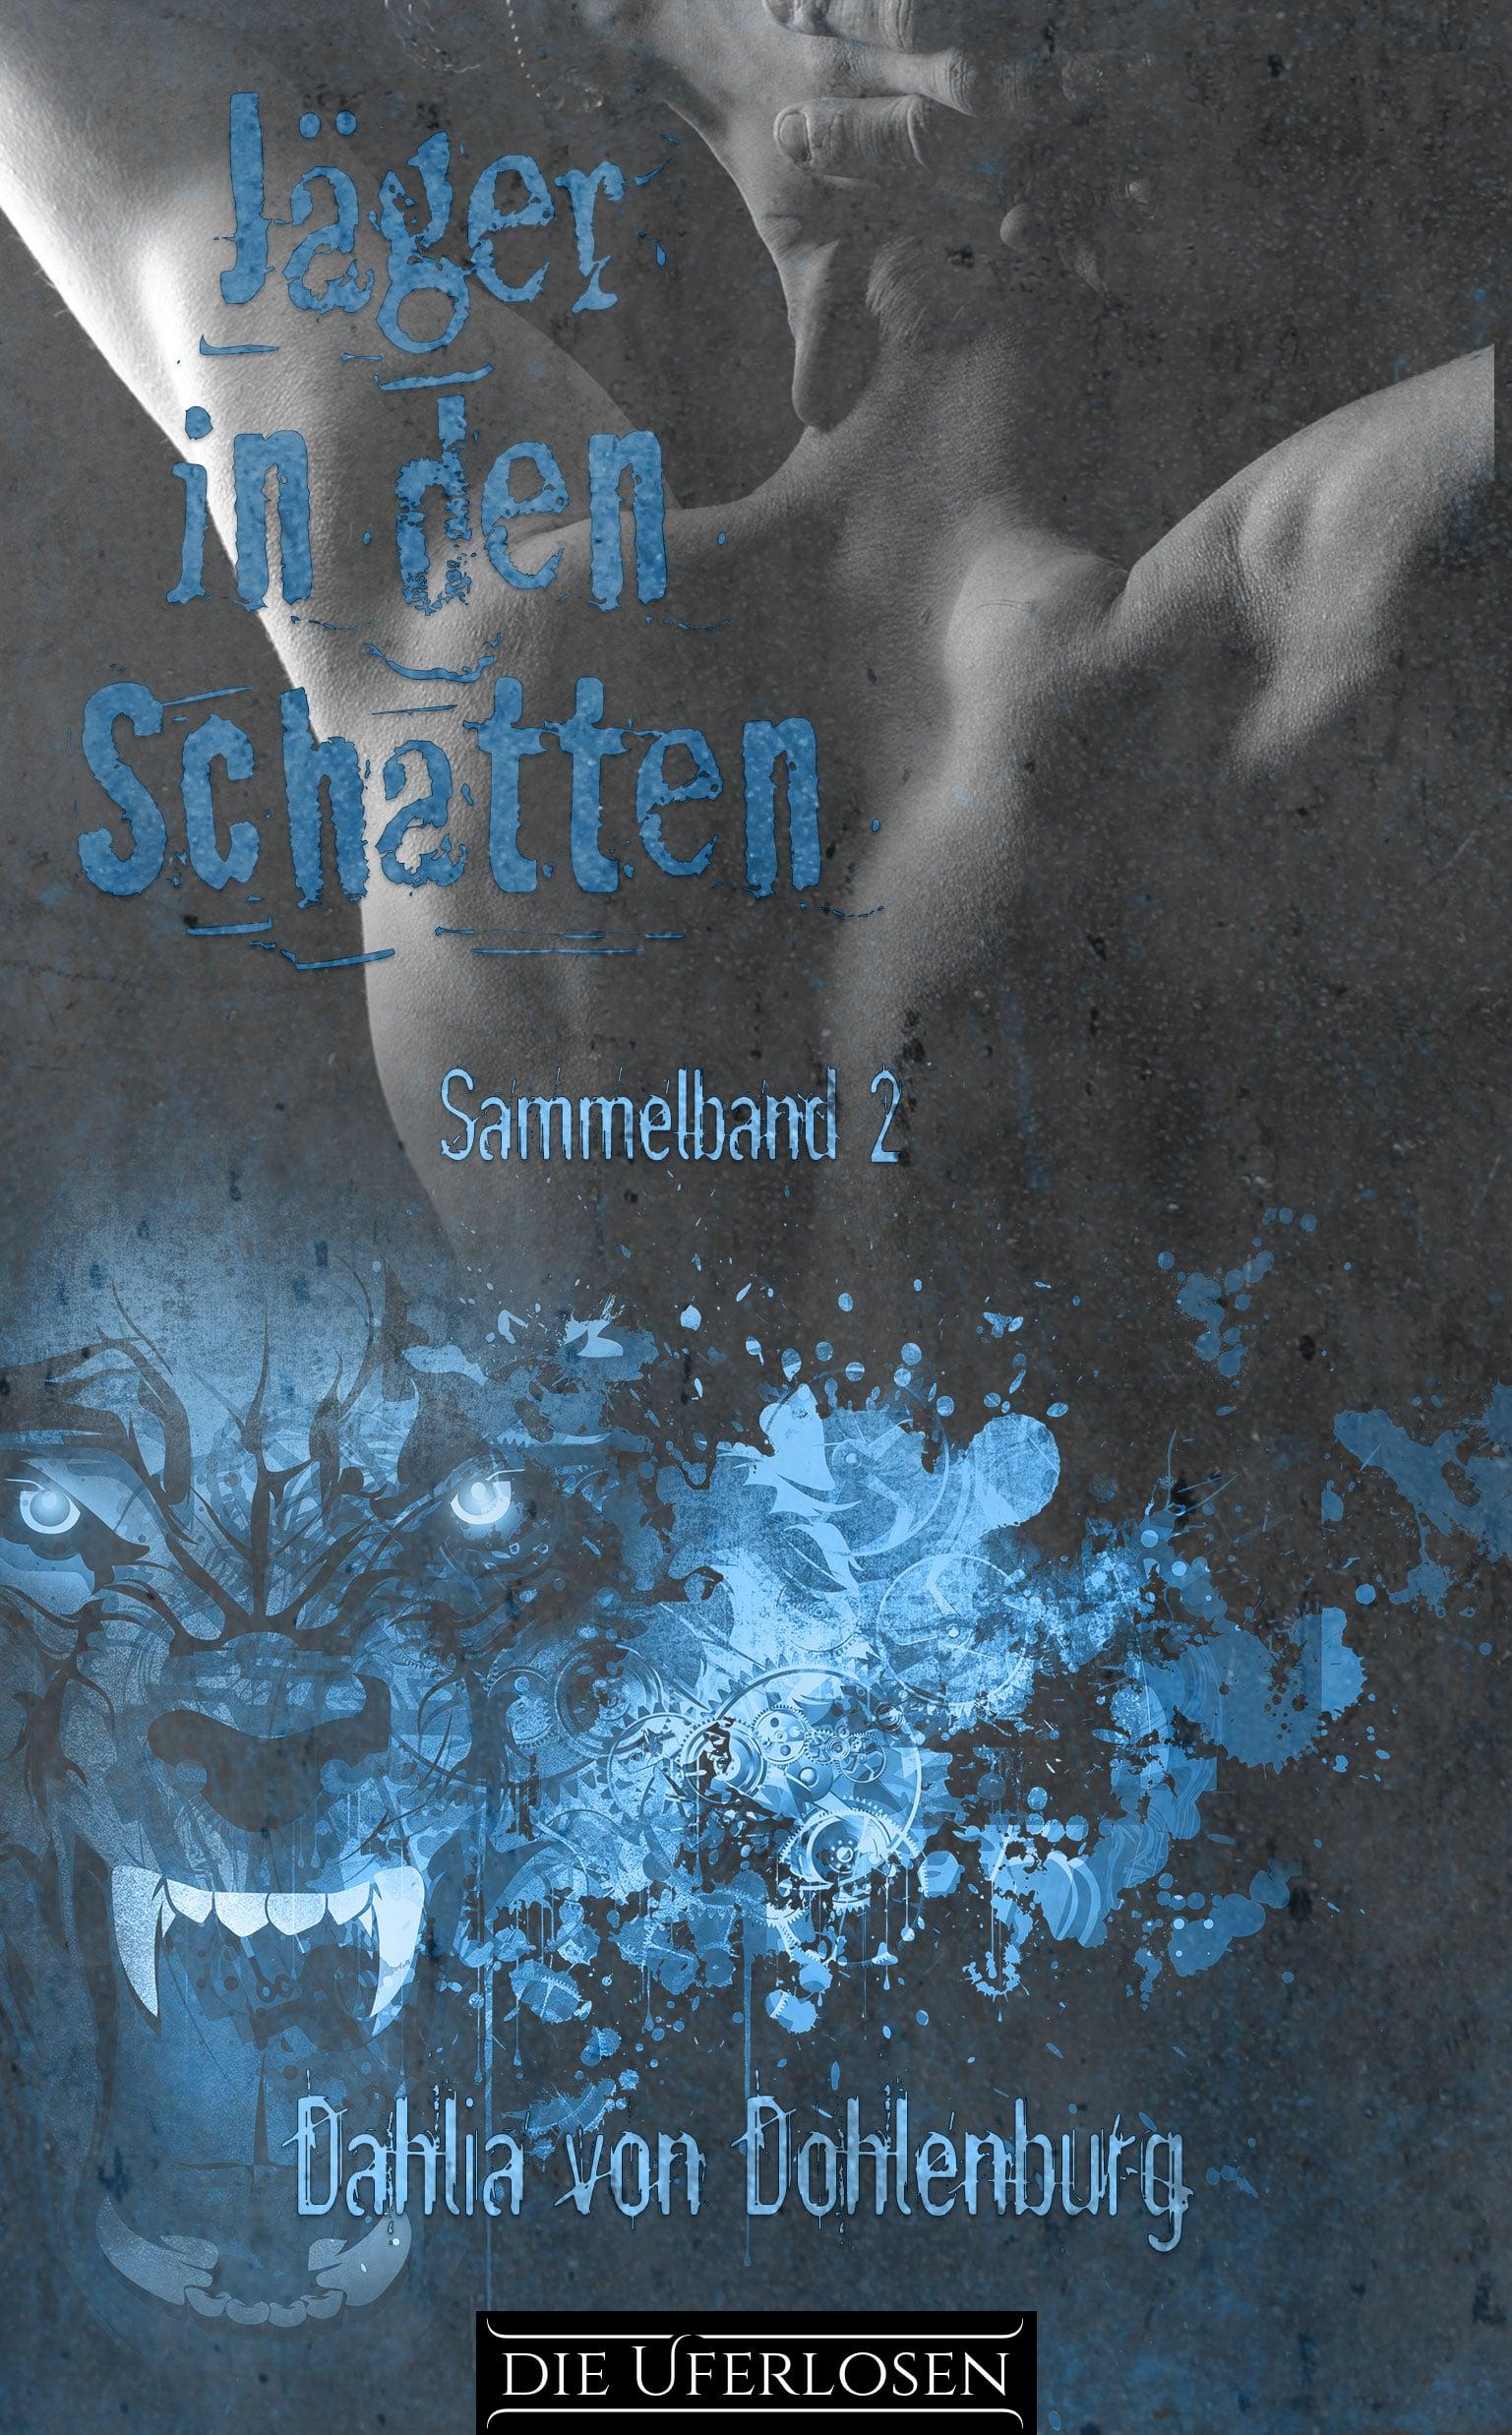 Jäger in den Schatten – Sammelband 2